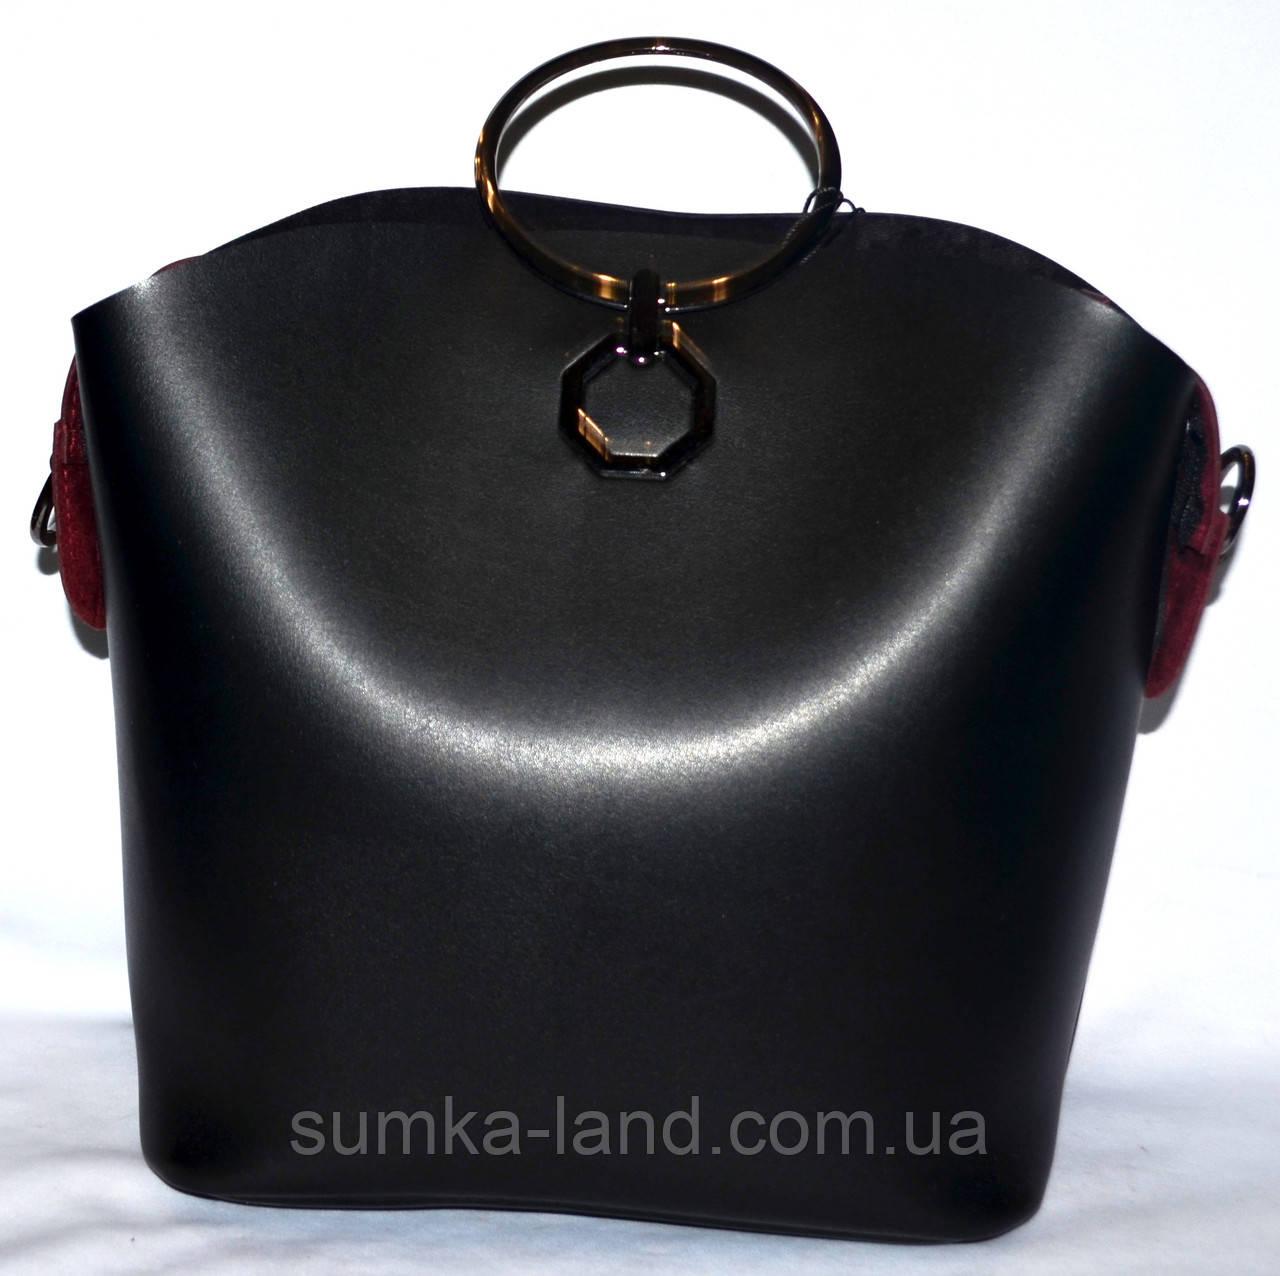 7ba30cbc5f78 Женская сумка Michael Kors с металлическими ручками 27 24 черная с бордо